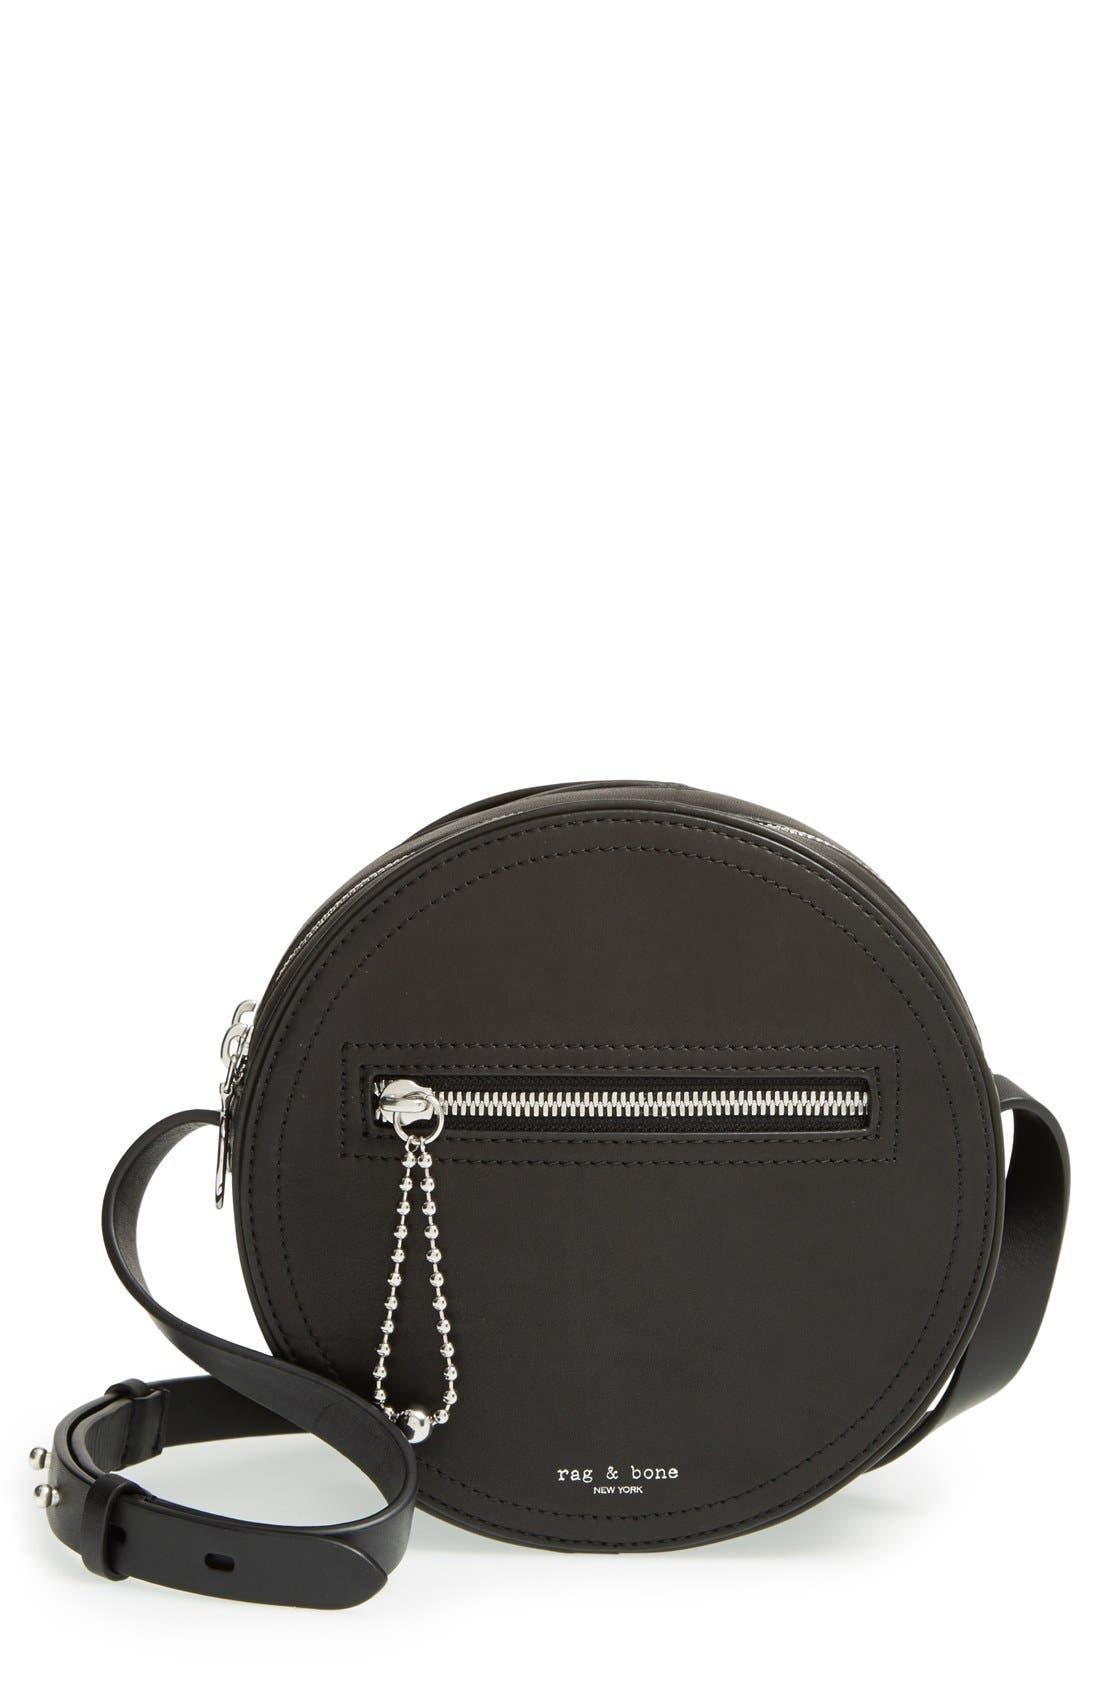 Alternate Image 1 Selected - rag & bone 'Circle' Leather Crossbody Bag